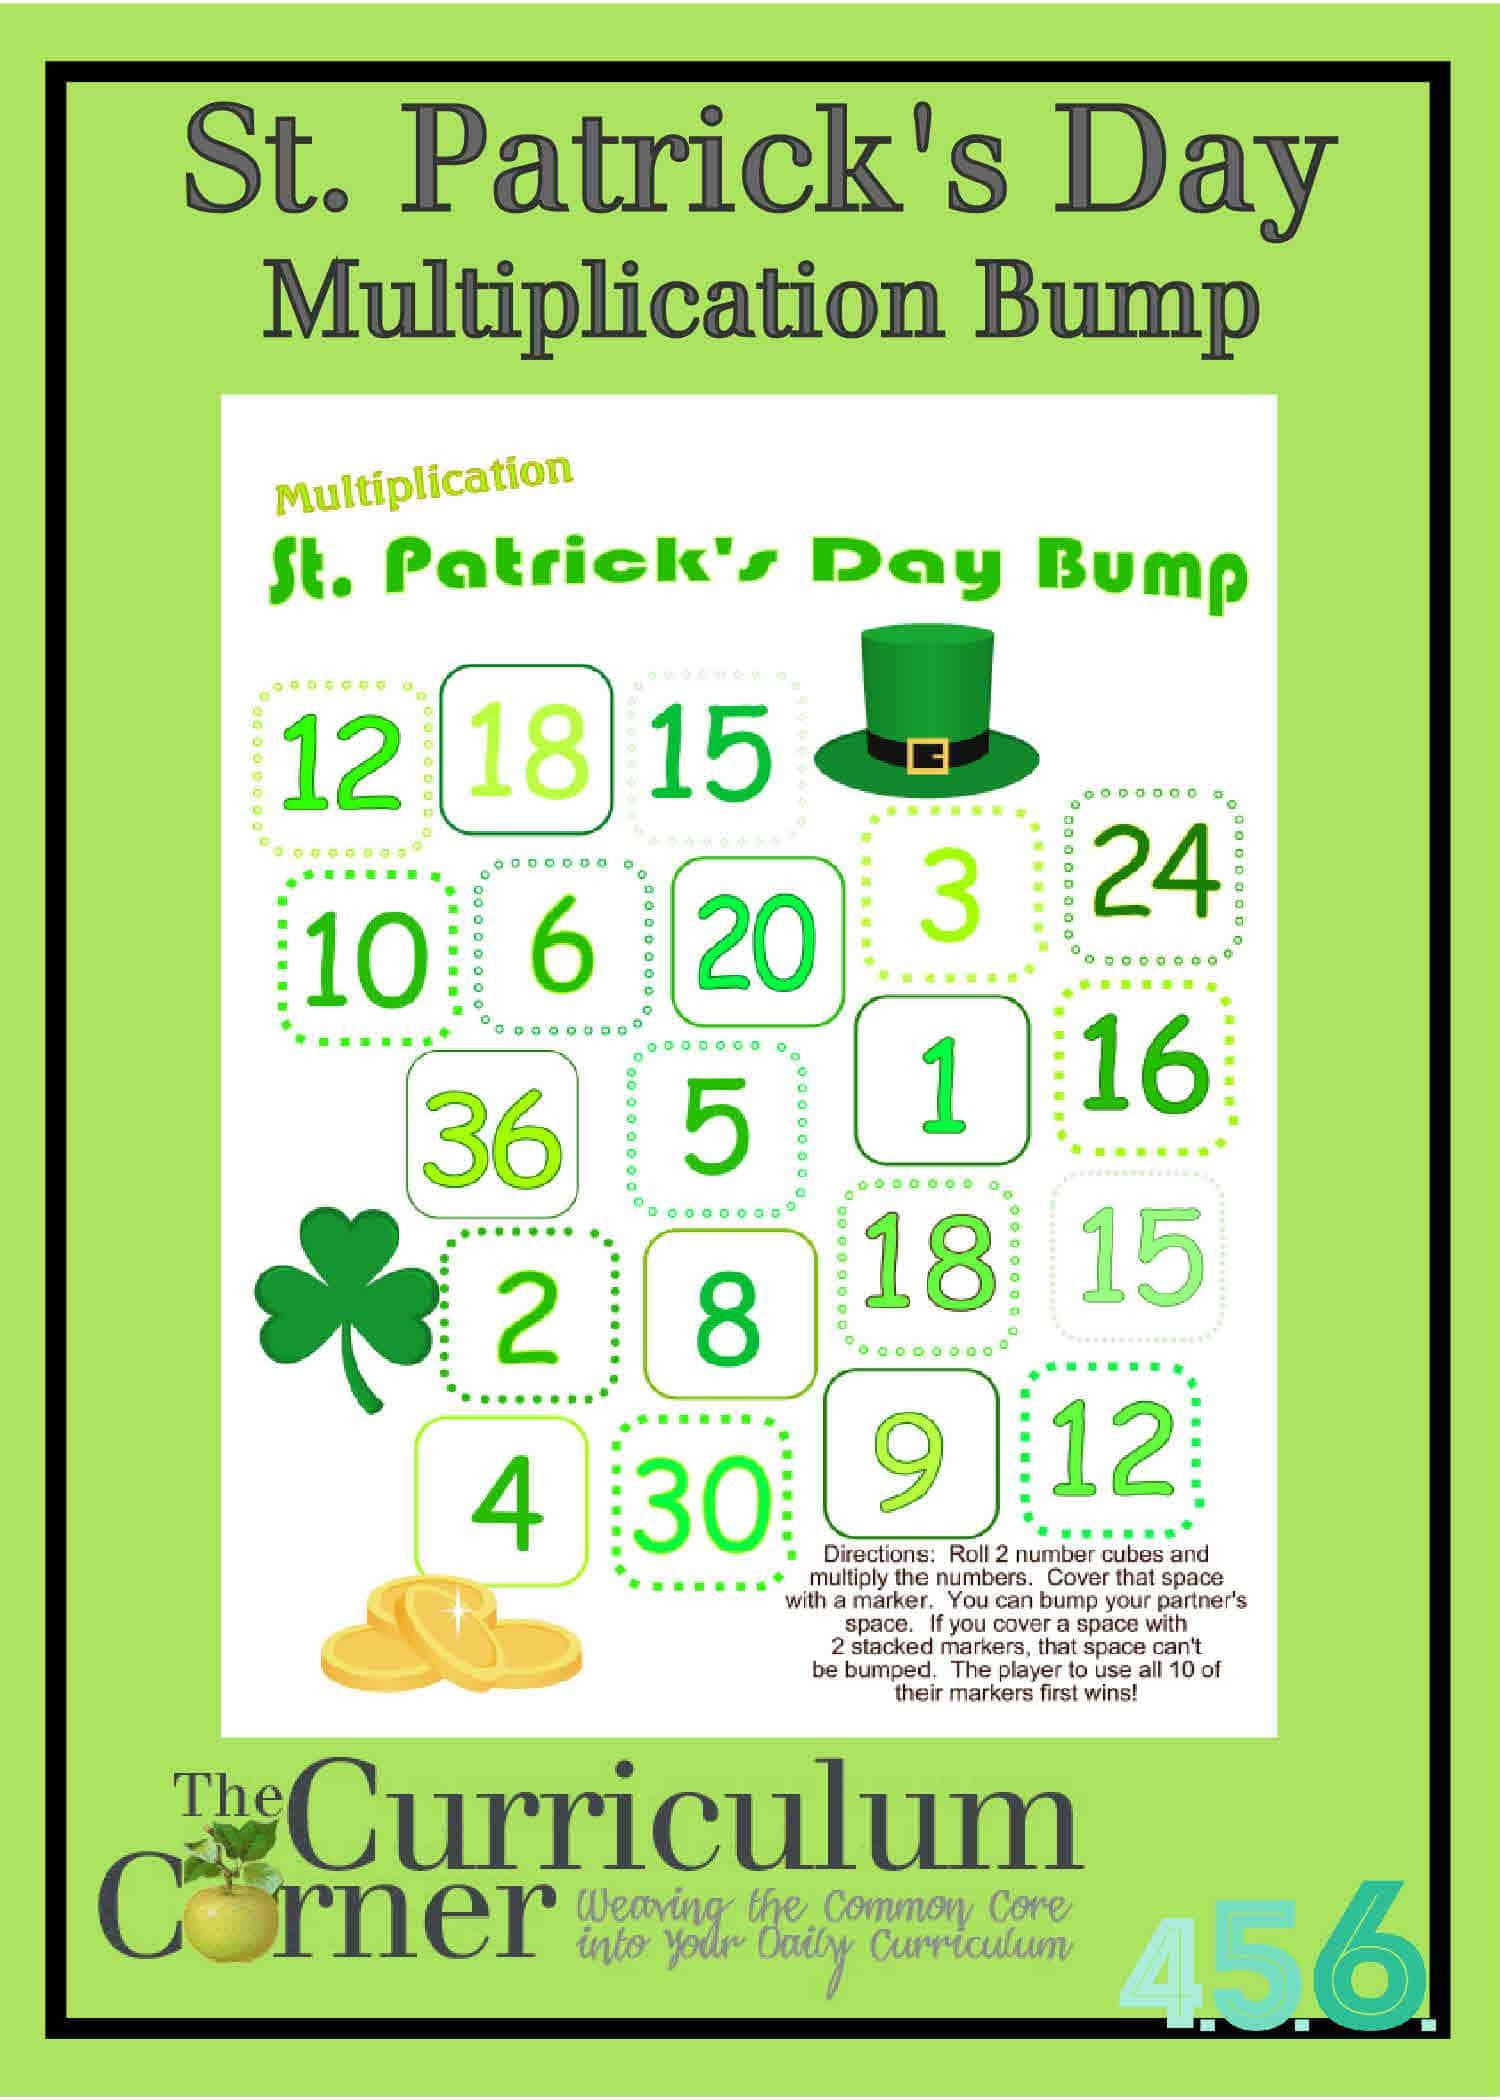 St. Patrick's Day Multiplication Bump